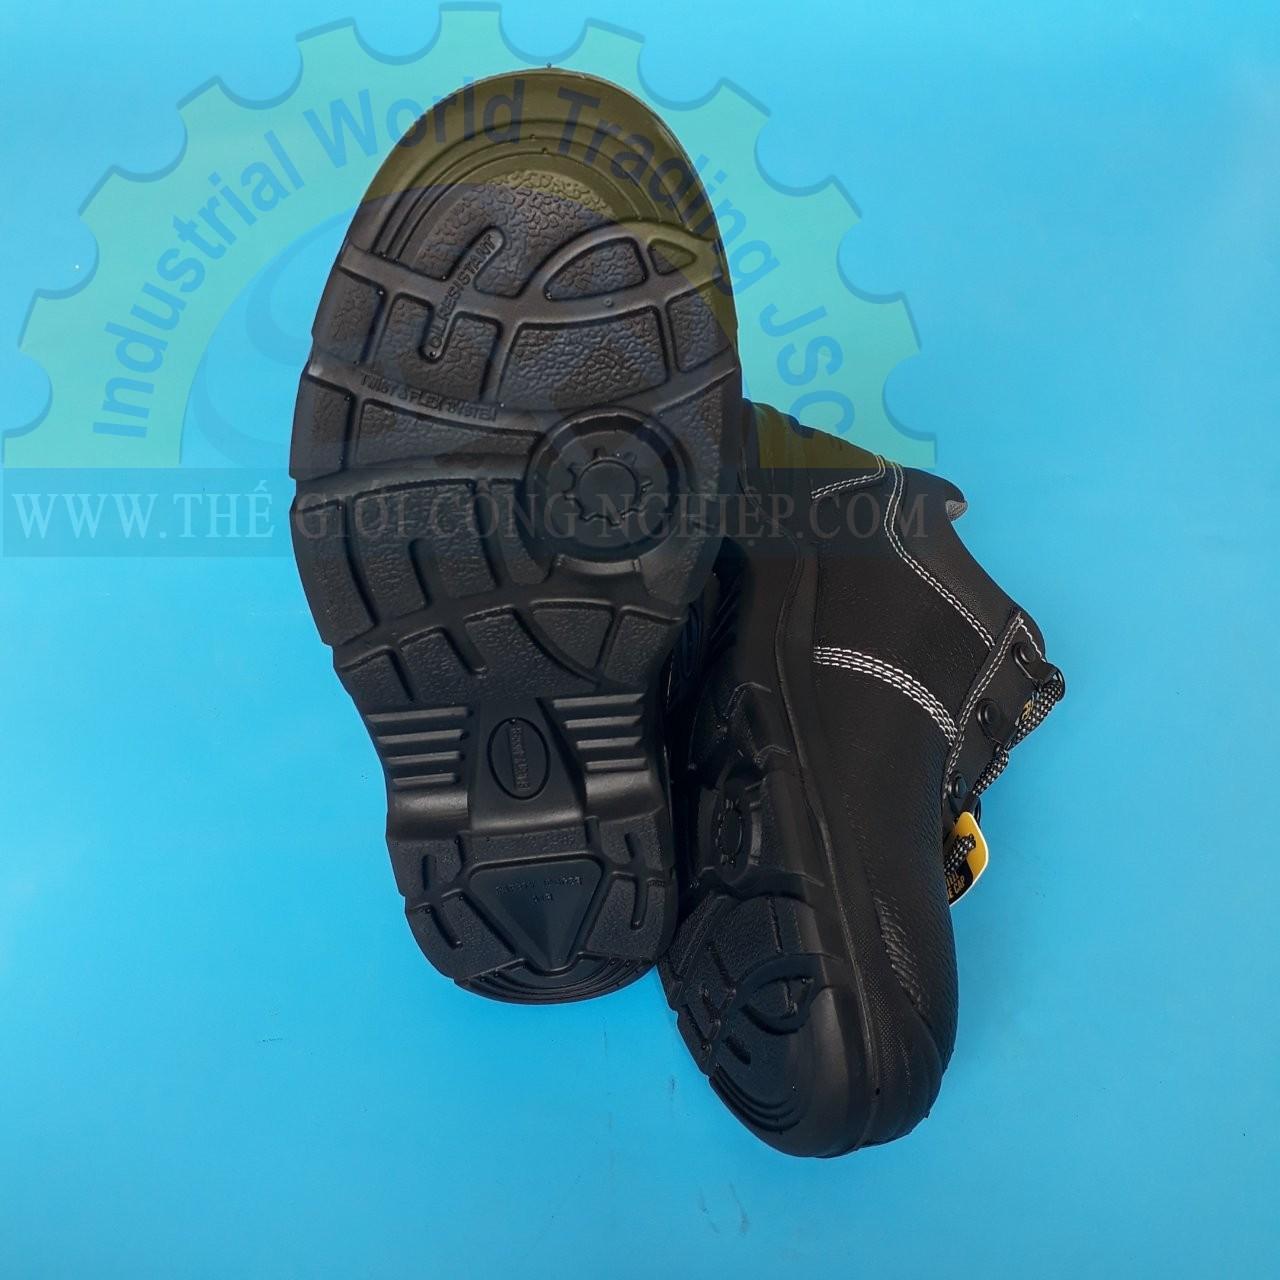 Giày bảo hộ lao động size 42  TGCN-34490 SAFETYJOGGER